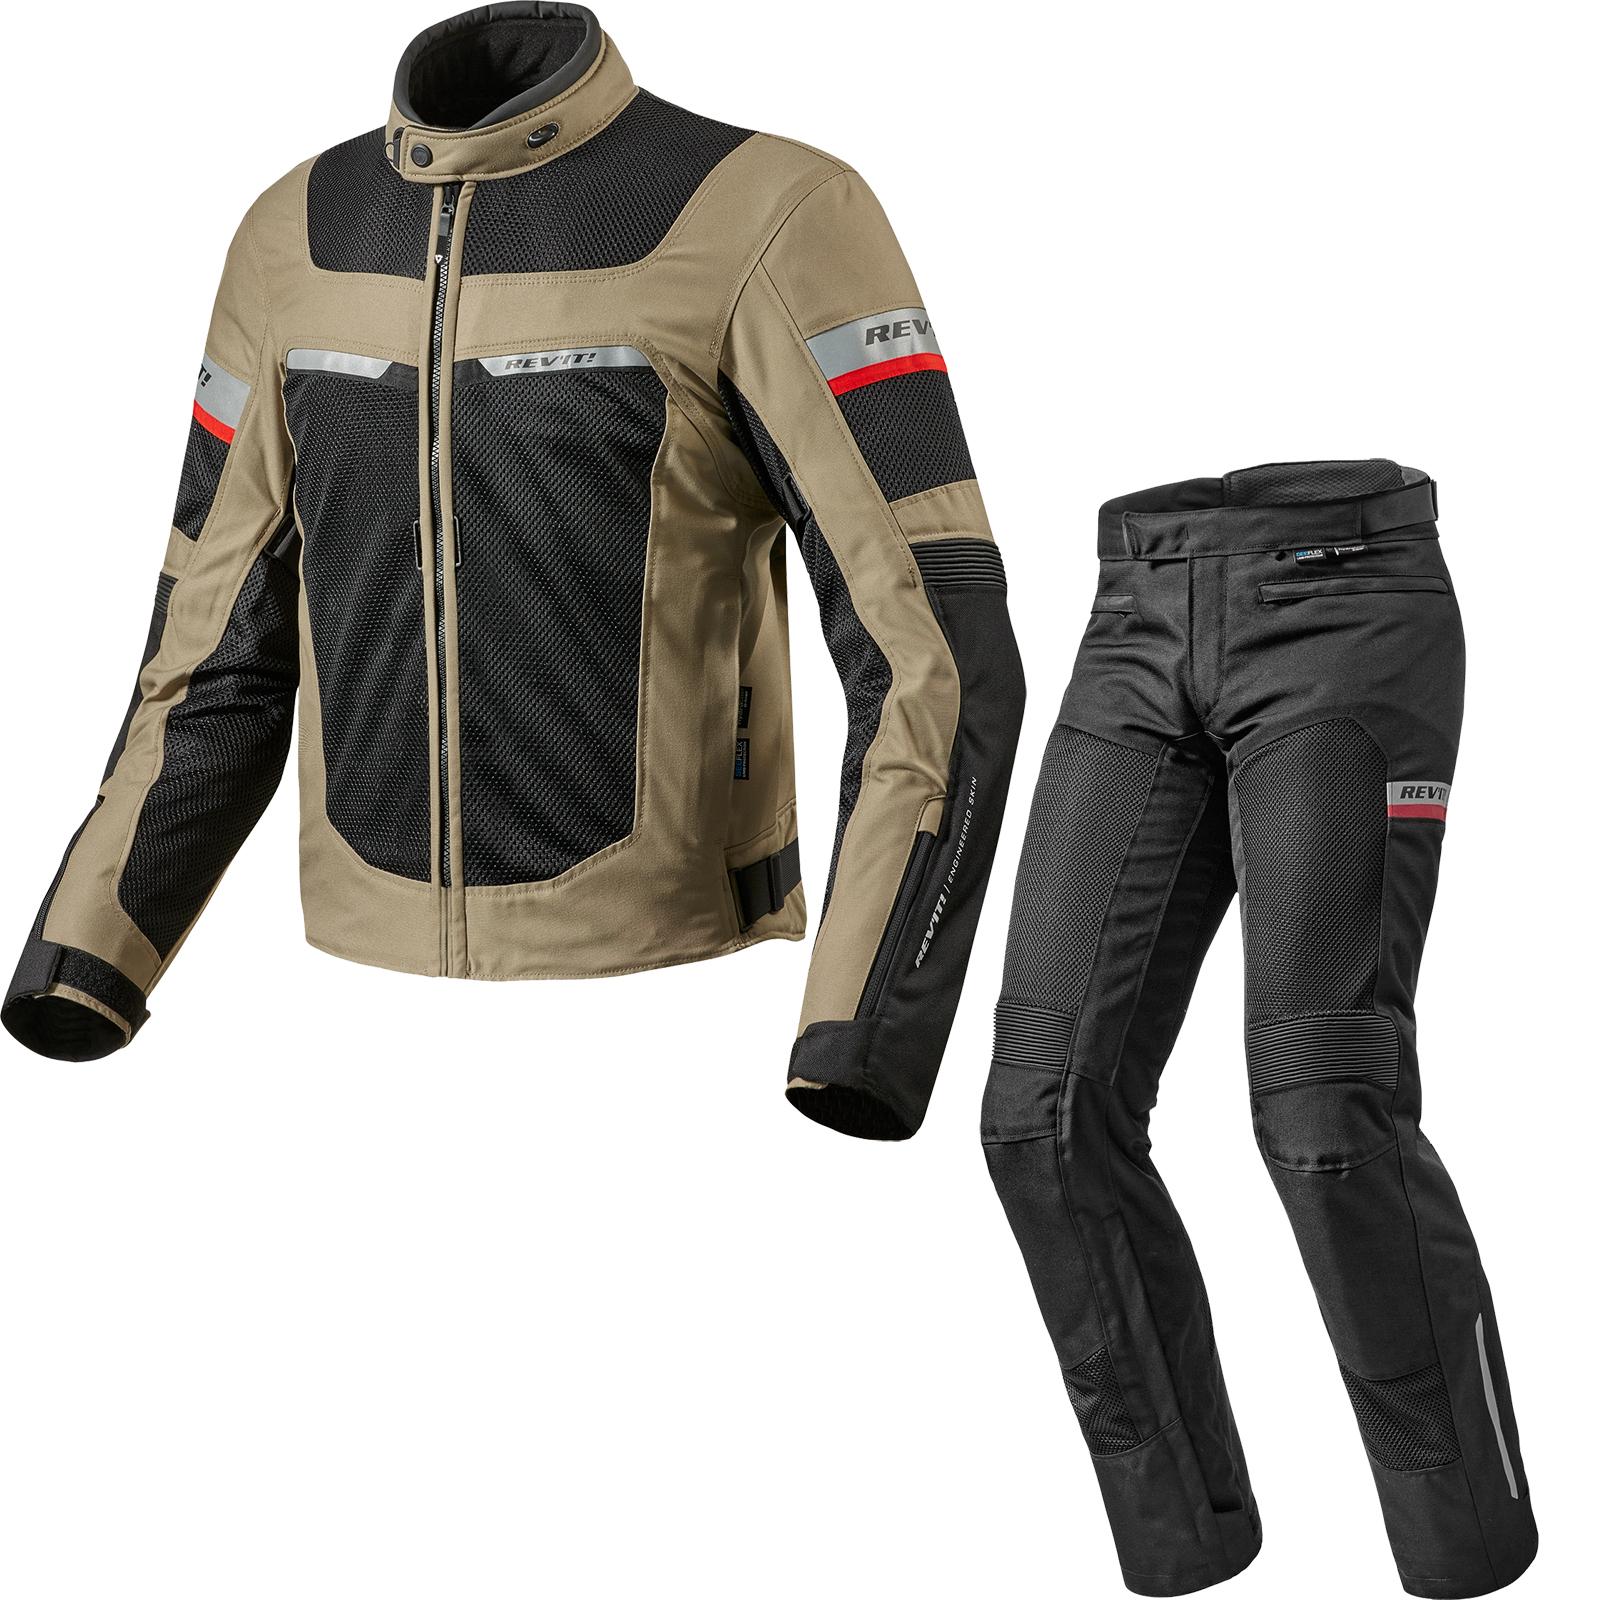 Black textile motorcycle jacket